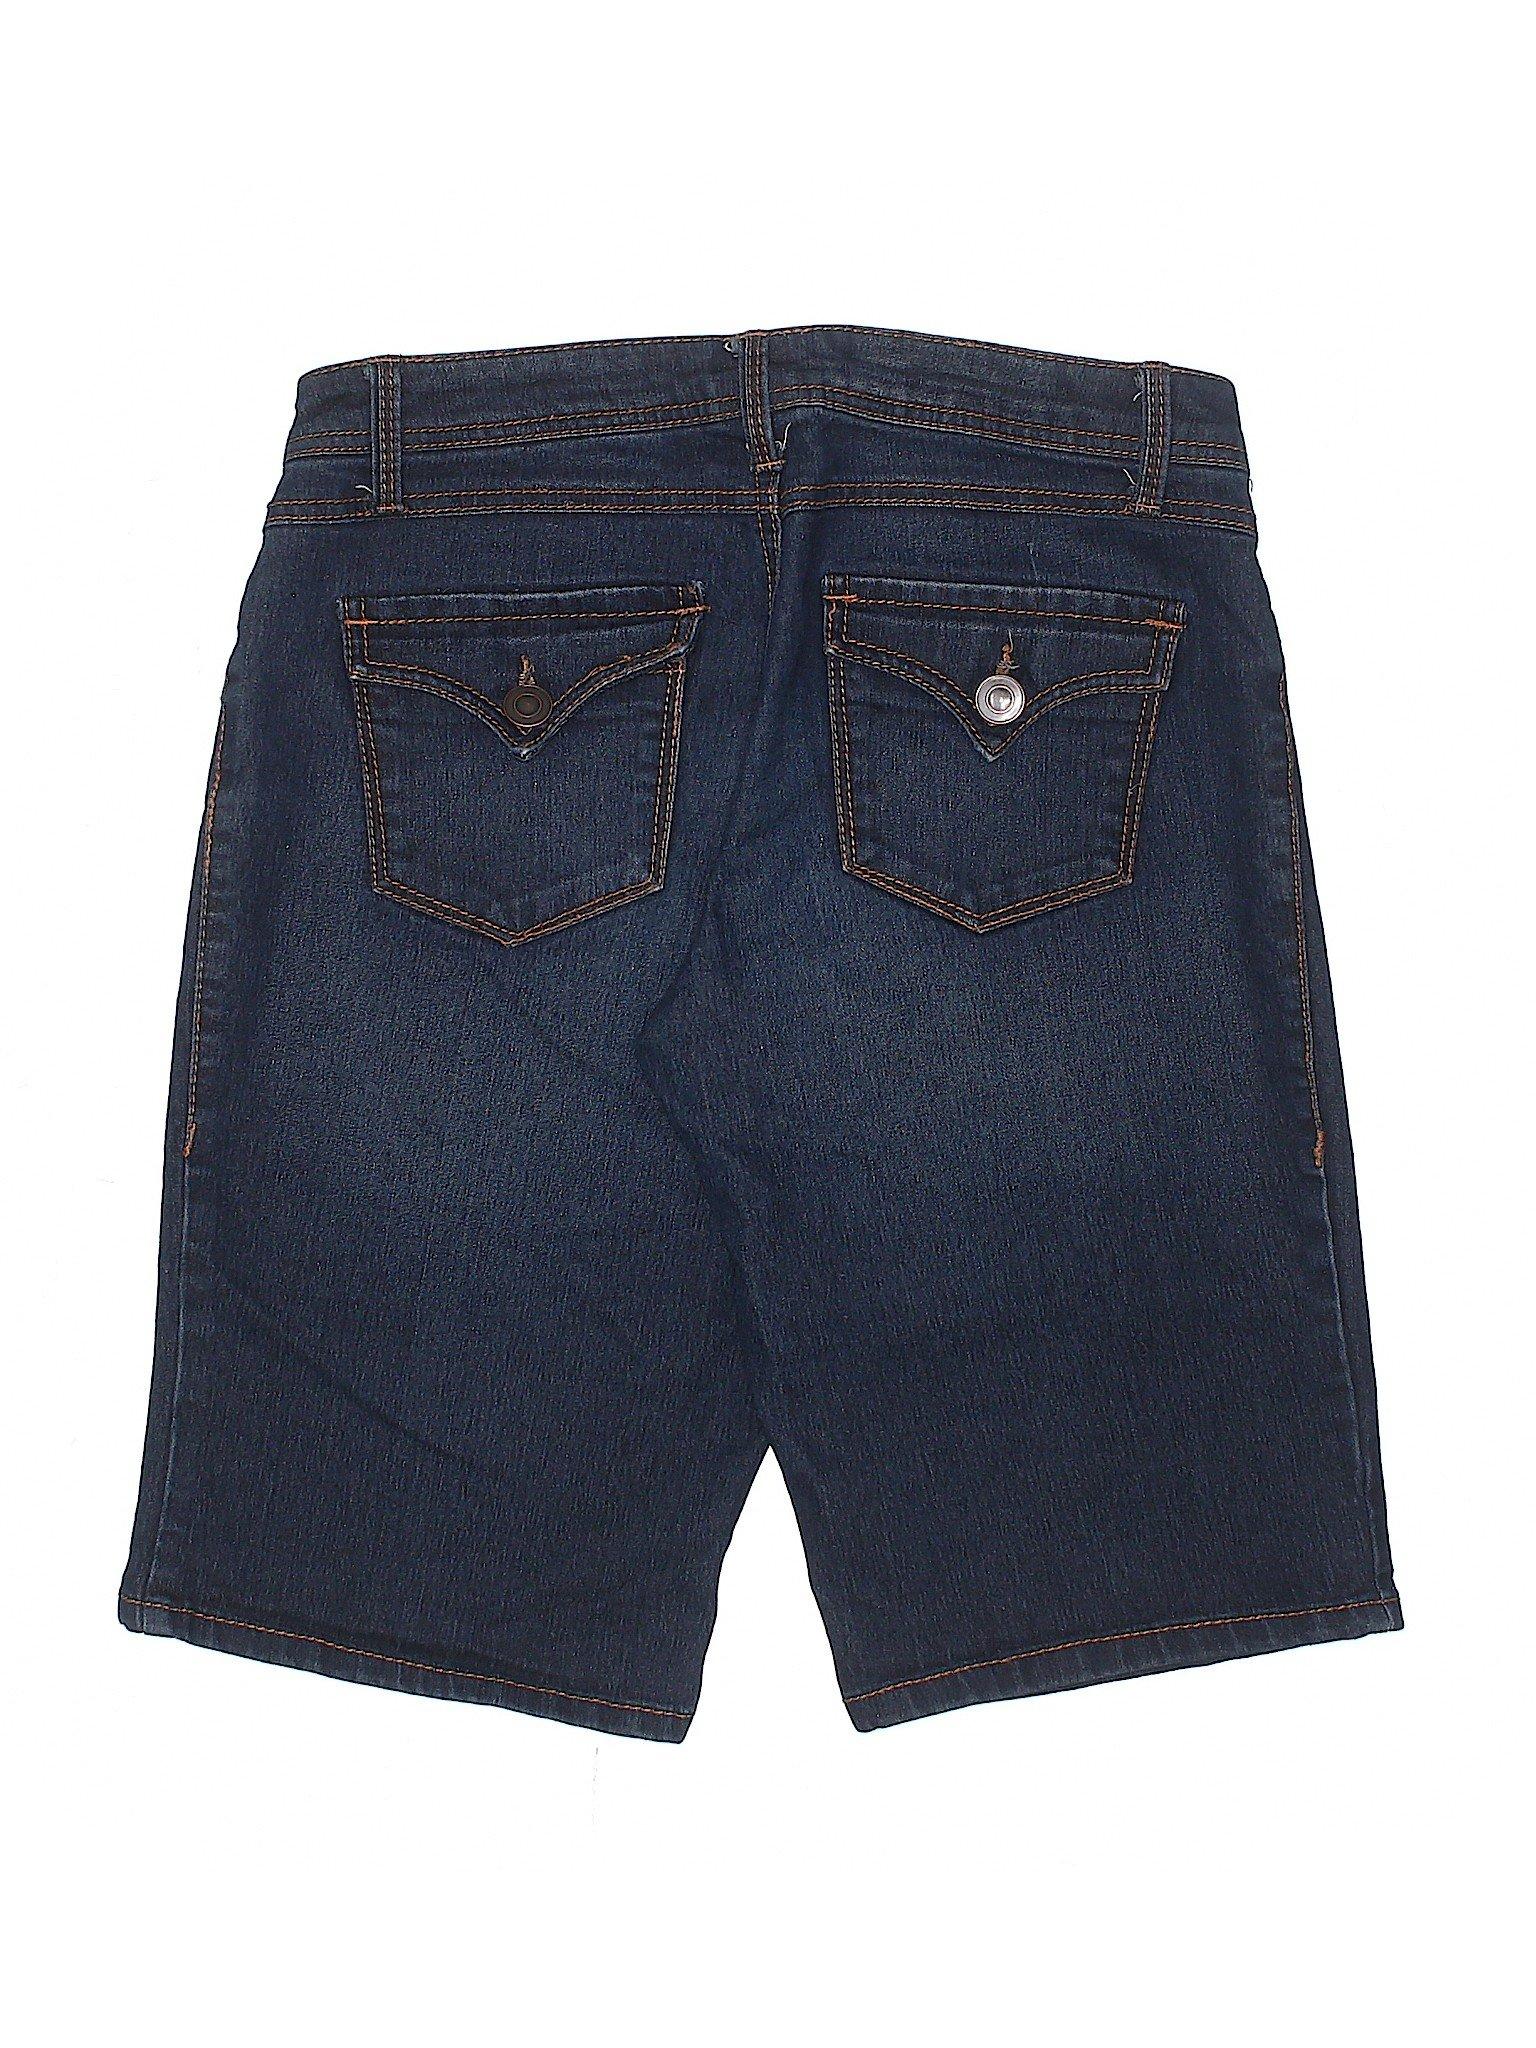 A n New Denim Approach Shorts a leisure a Boutique xTnapqW